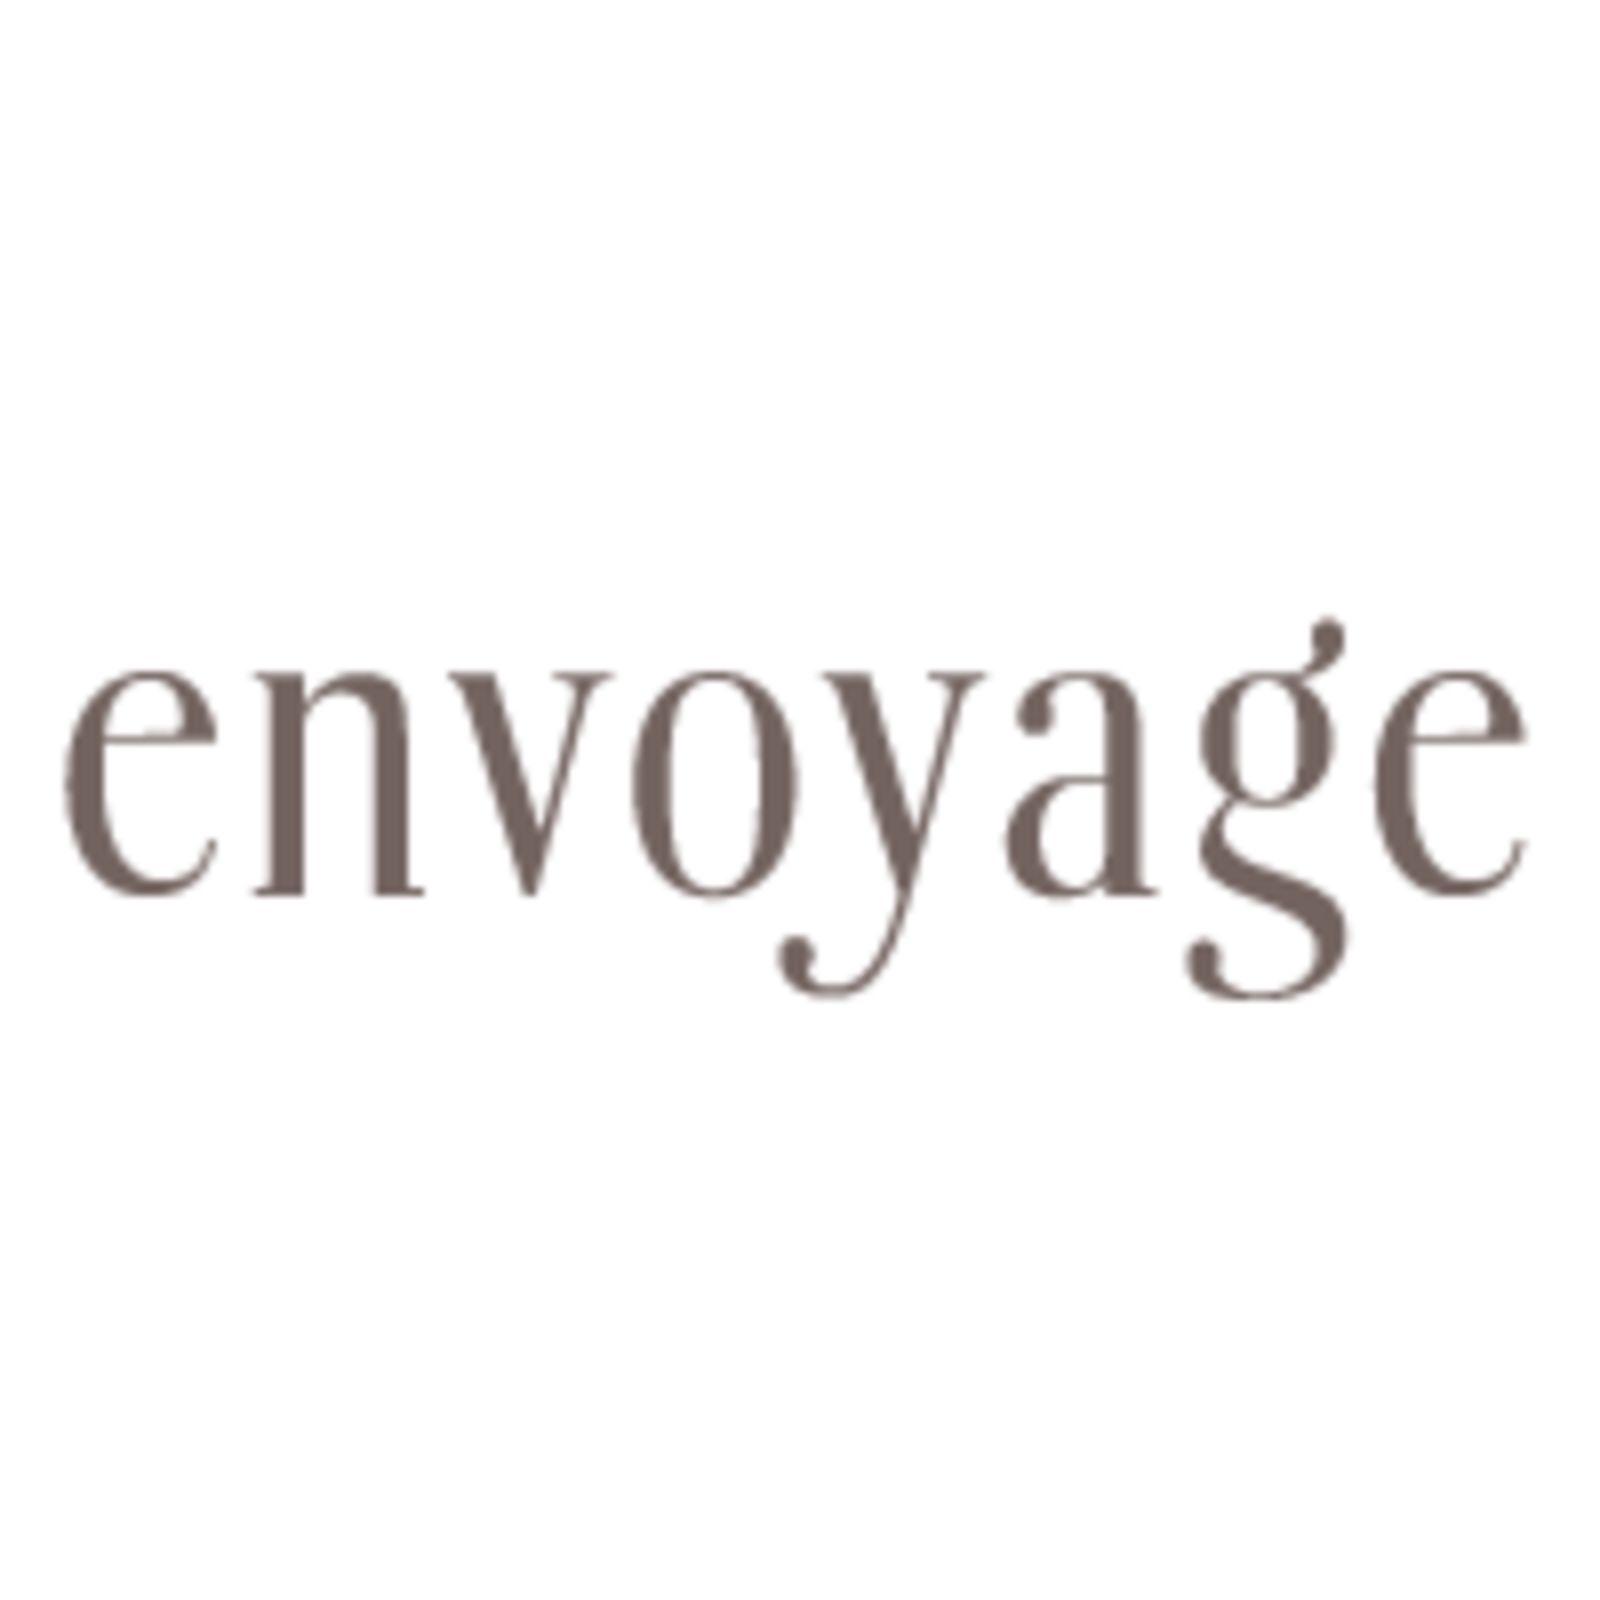 envoyage